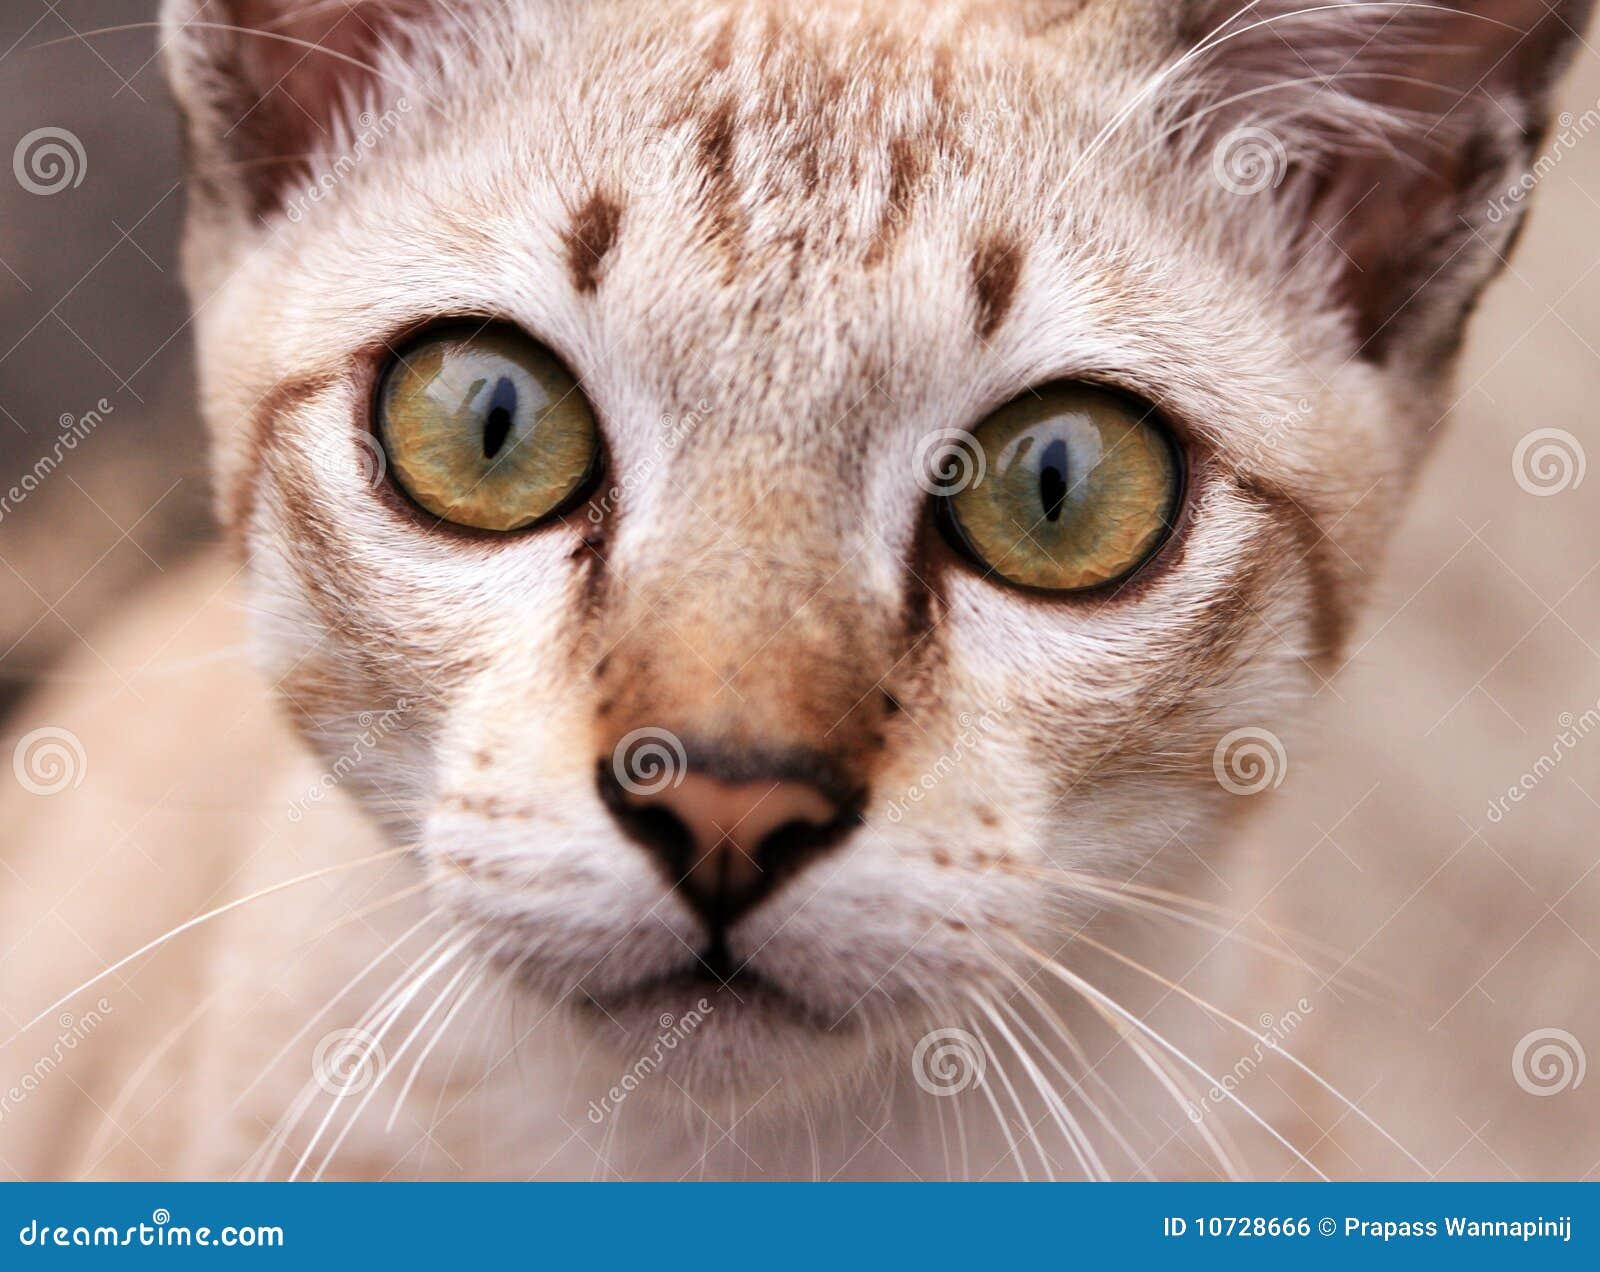 close-up-kitten-eyes-10728666.jpg